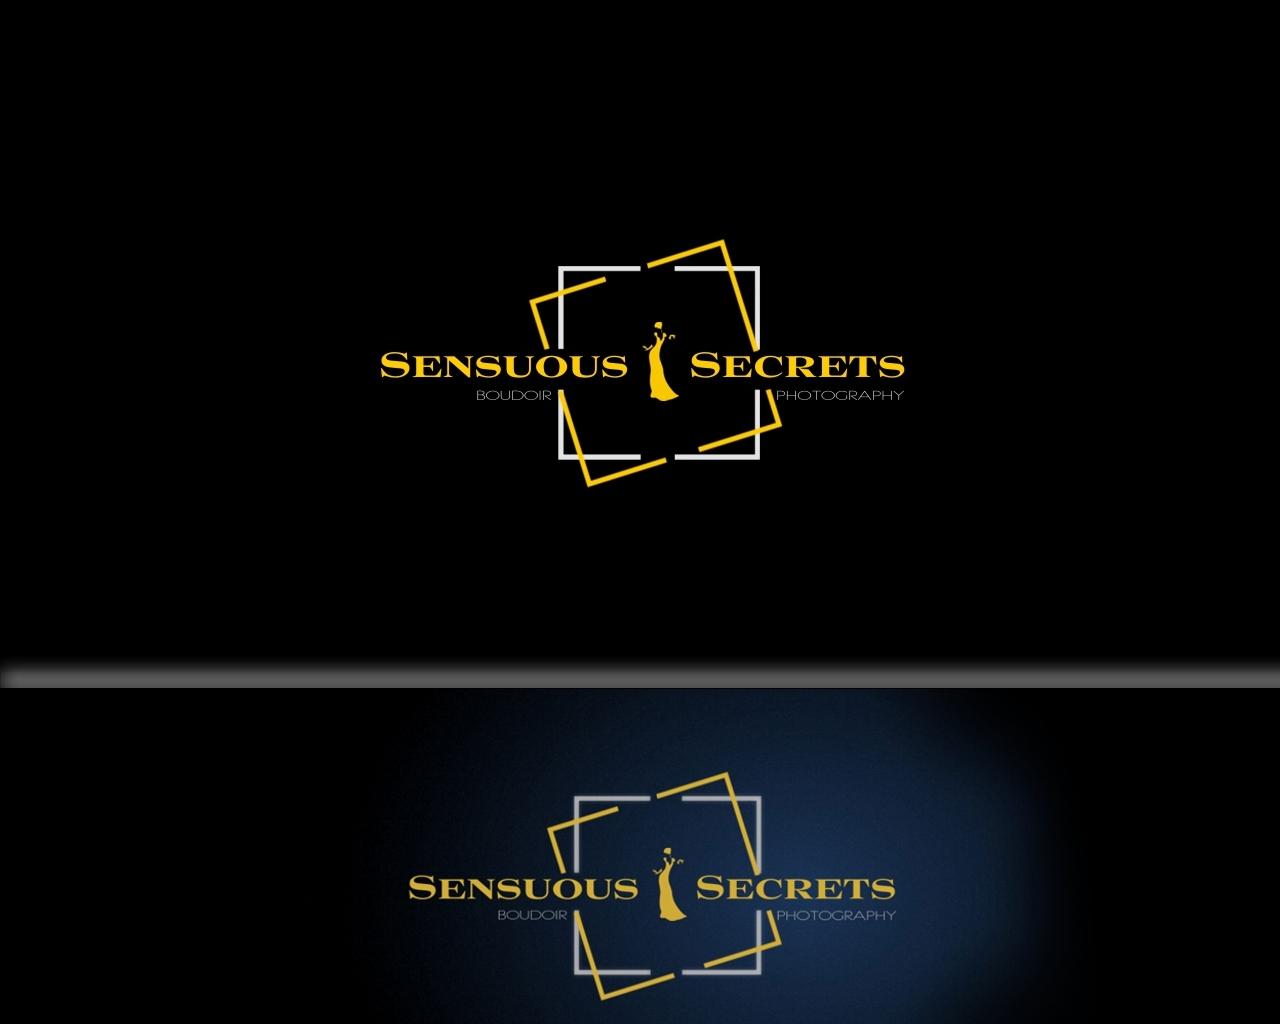 Logo Design by Q_Division_Designs - Entry No. 41 in the Logo Design Contest Artistic Logo Design for Sensuous Secrets Boudoir Photography.